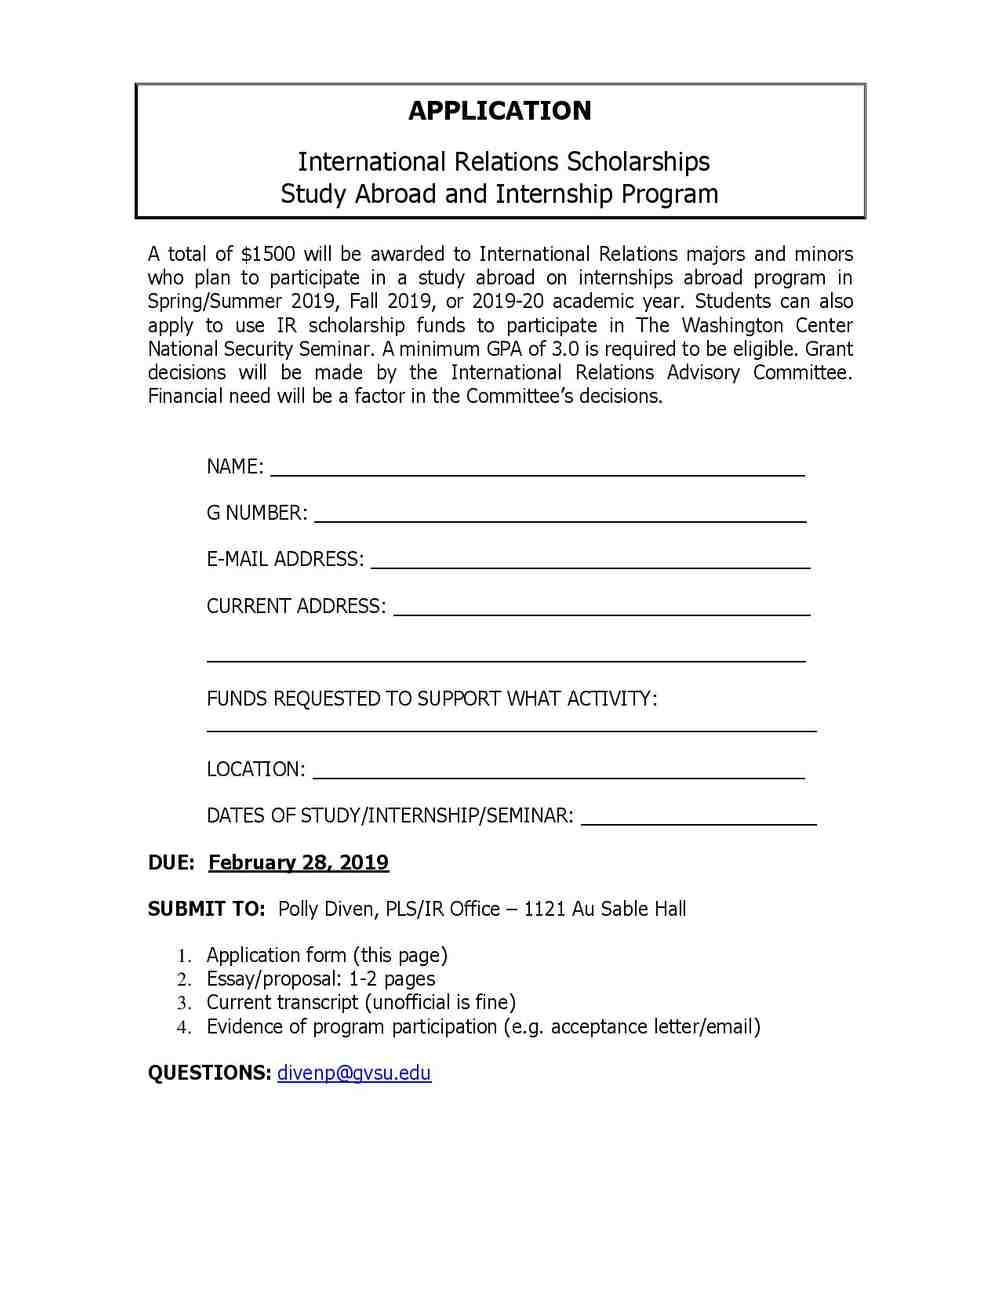 Graduate school admission essay questions